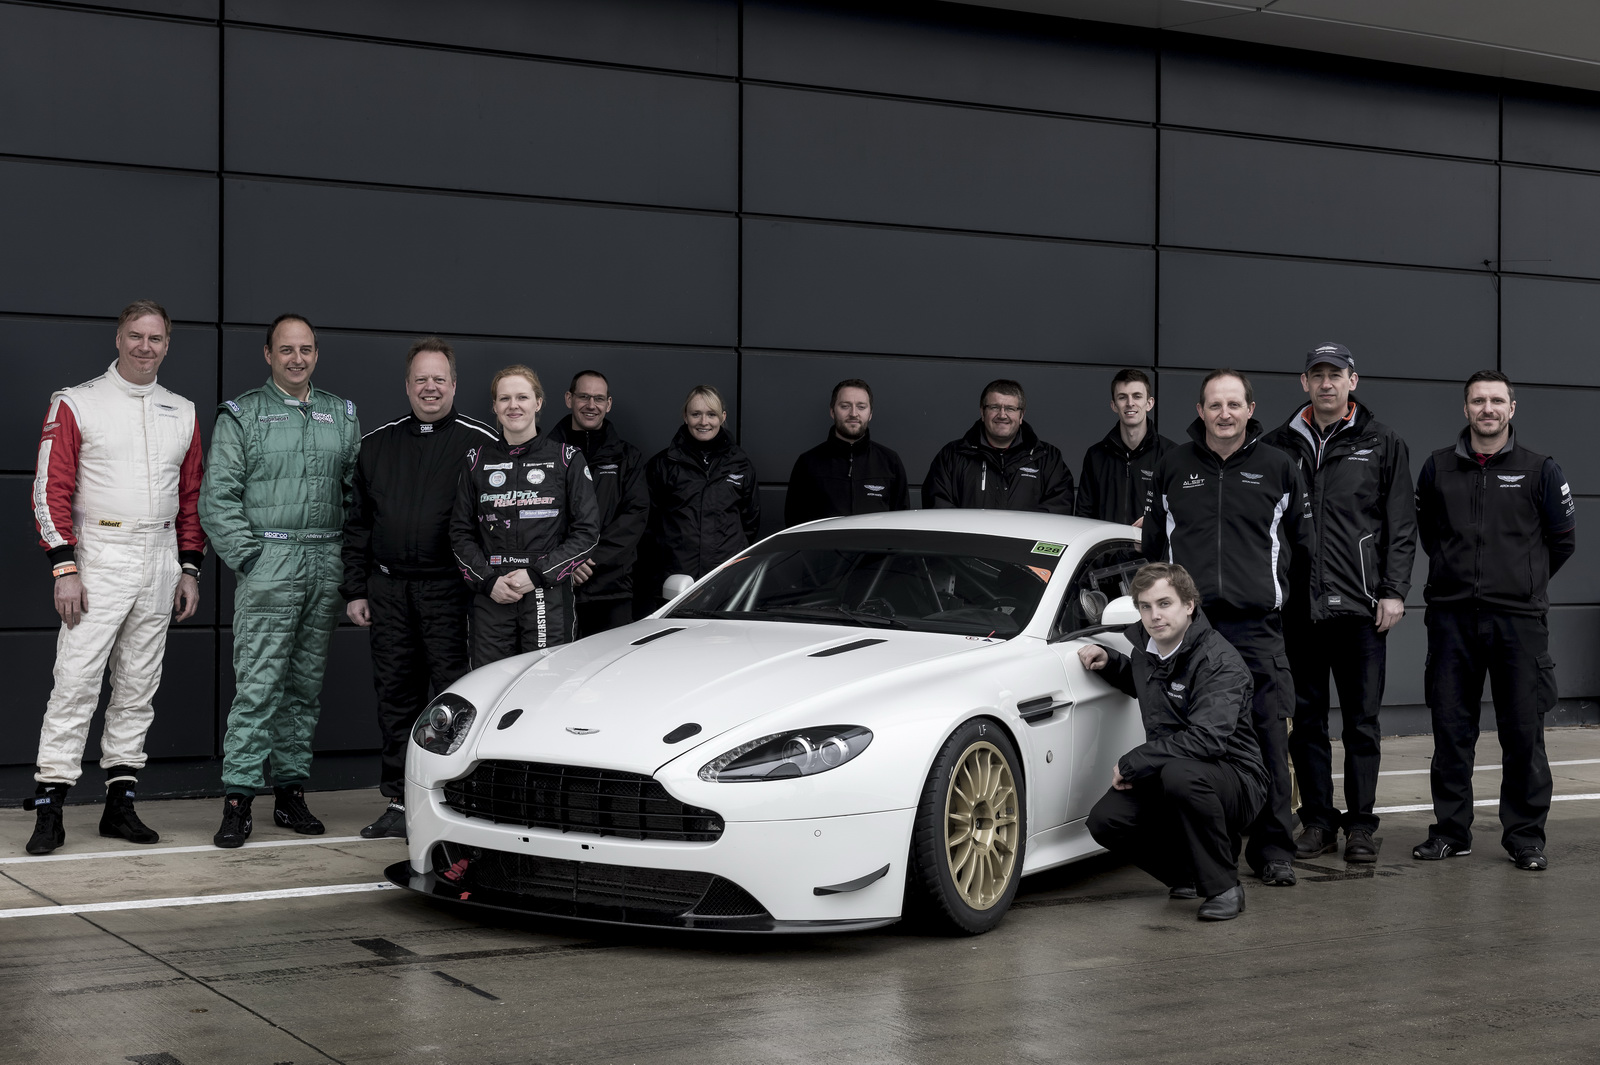 HQ Aston Martin Vantage GT4 Wallpapers | File 454.12Kb